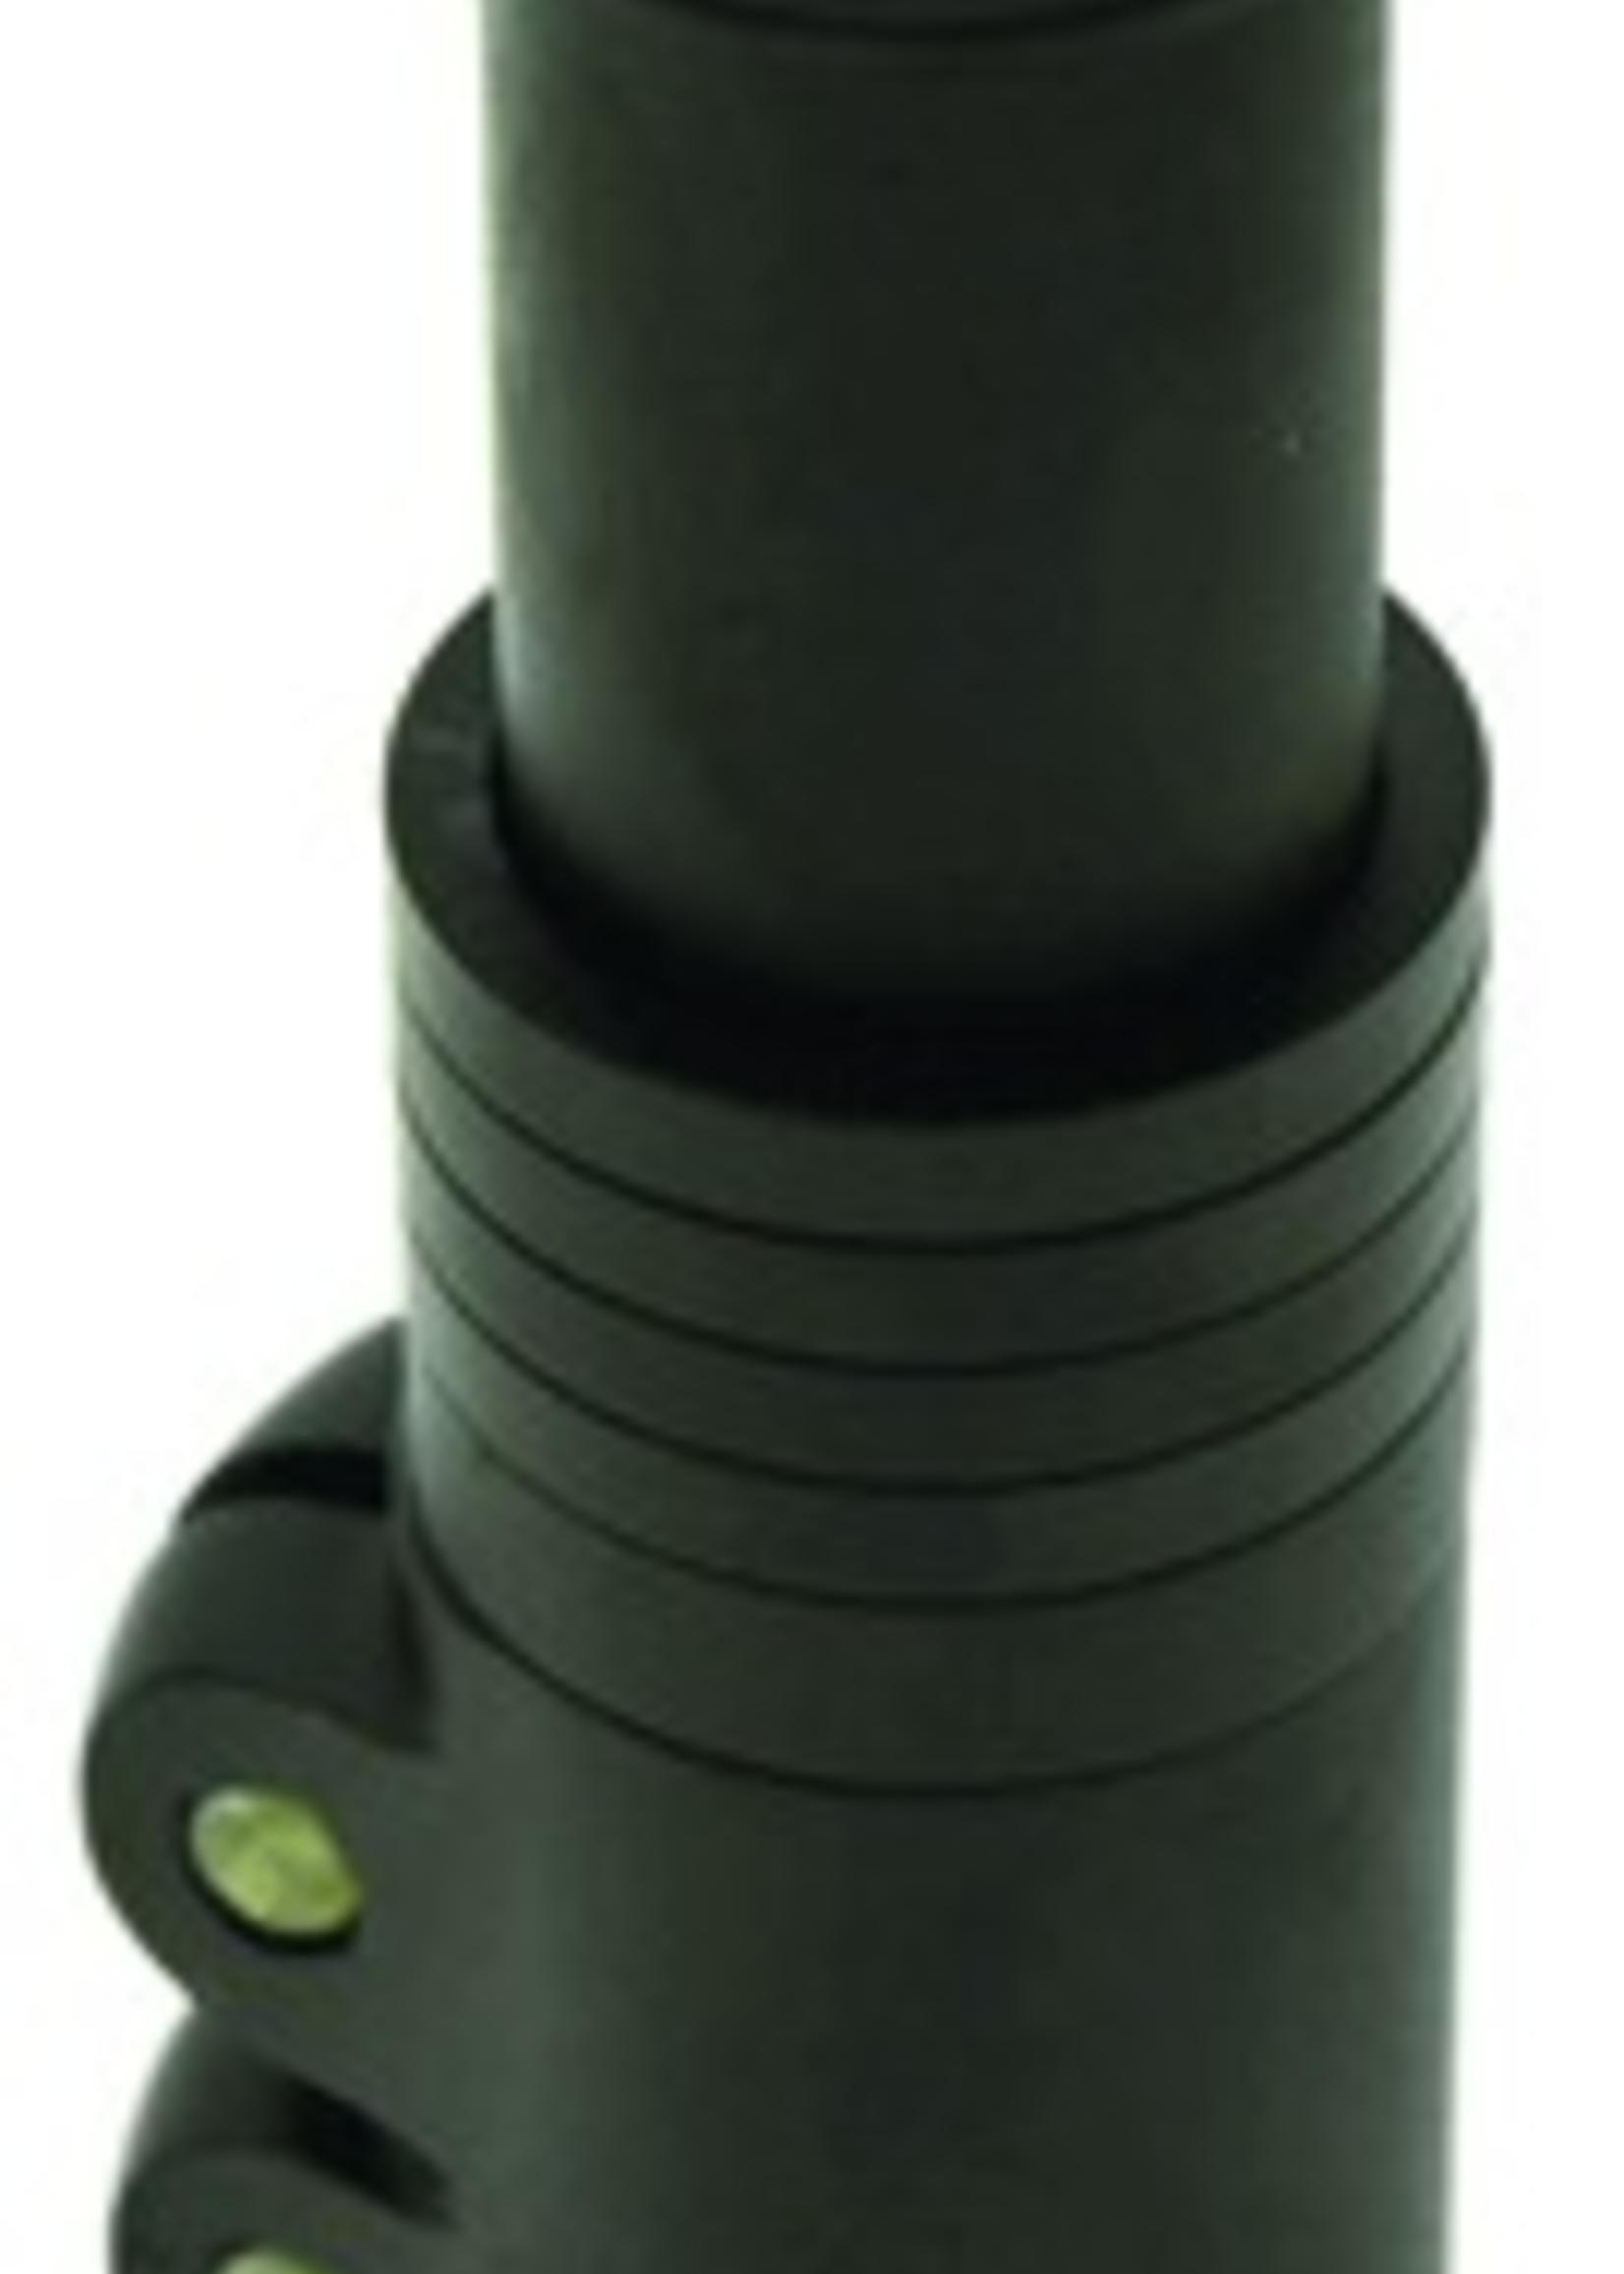 49 N 49 N Threadless Stem Height Extender - Black